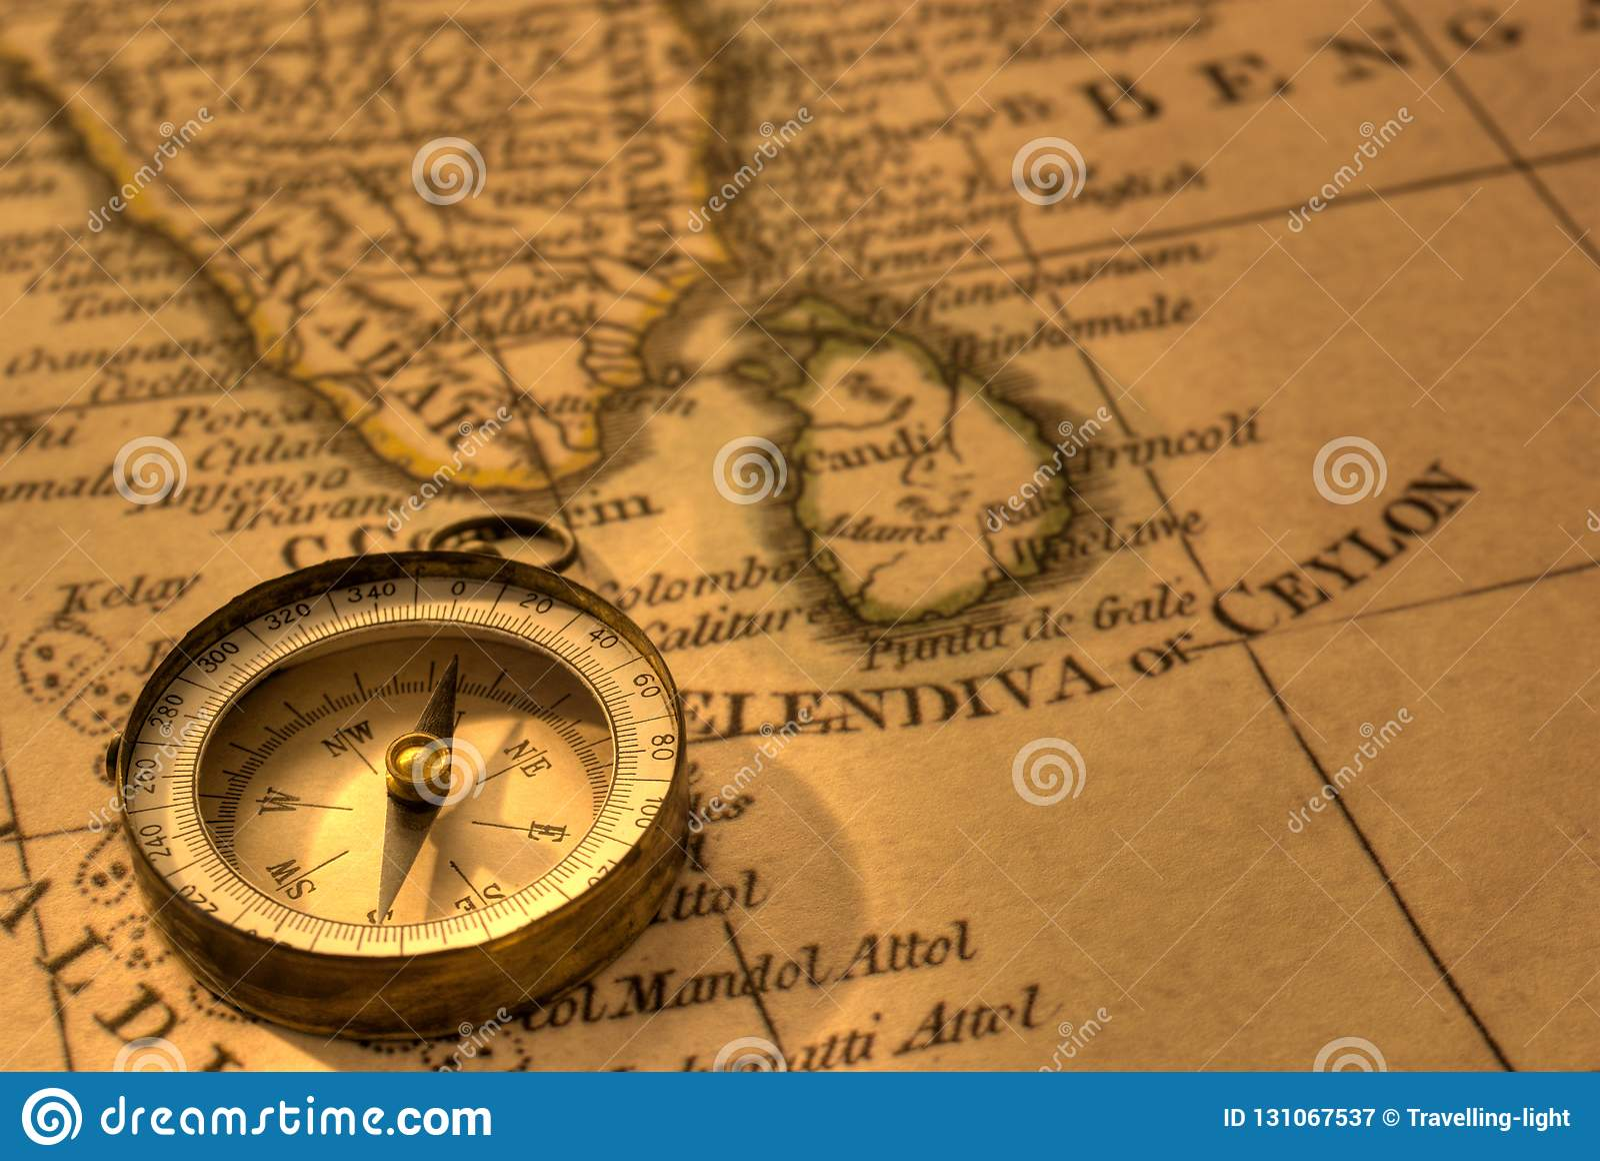 Comp and Old Map India stock image. Image of comp ... Map India Sri Lanka on map hong kong, map india world, map india indus river, map india pakistan, map cambodia, map singapore, map india china, map india maldives, map india afghanistan, map india syria, map india himalayas, map india united states, map brazil, map malaysia, map australia, map india thailand, map india to japan, map india tibet, map india mauritius, map india bangladesh,